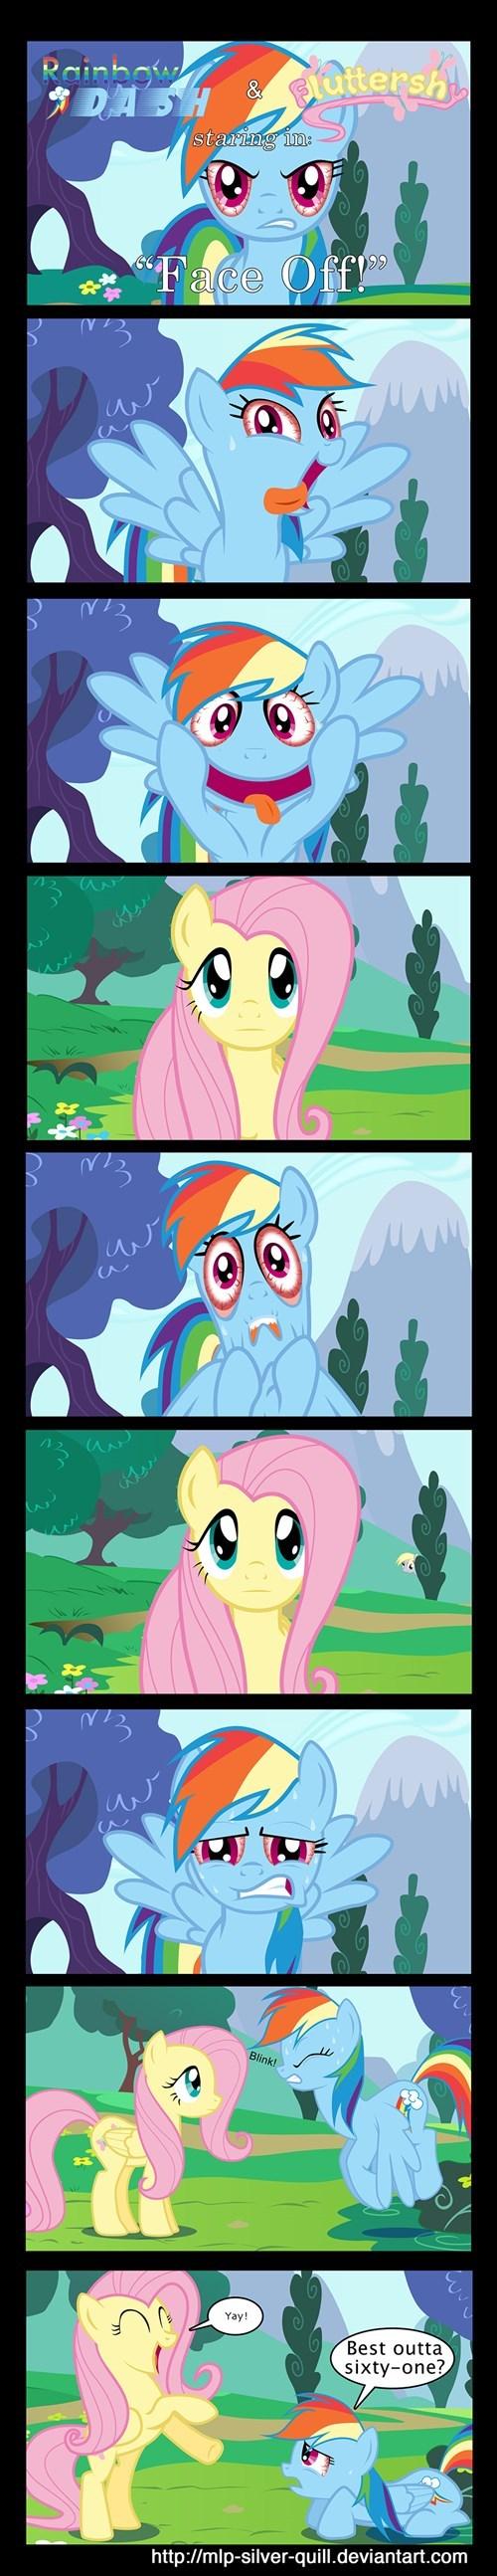 my-little-pony-rainbow-dash-fluttershy-staring-contest